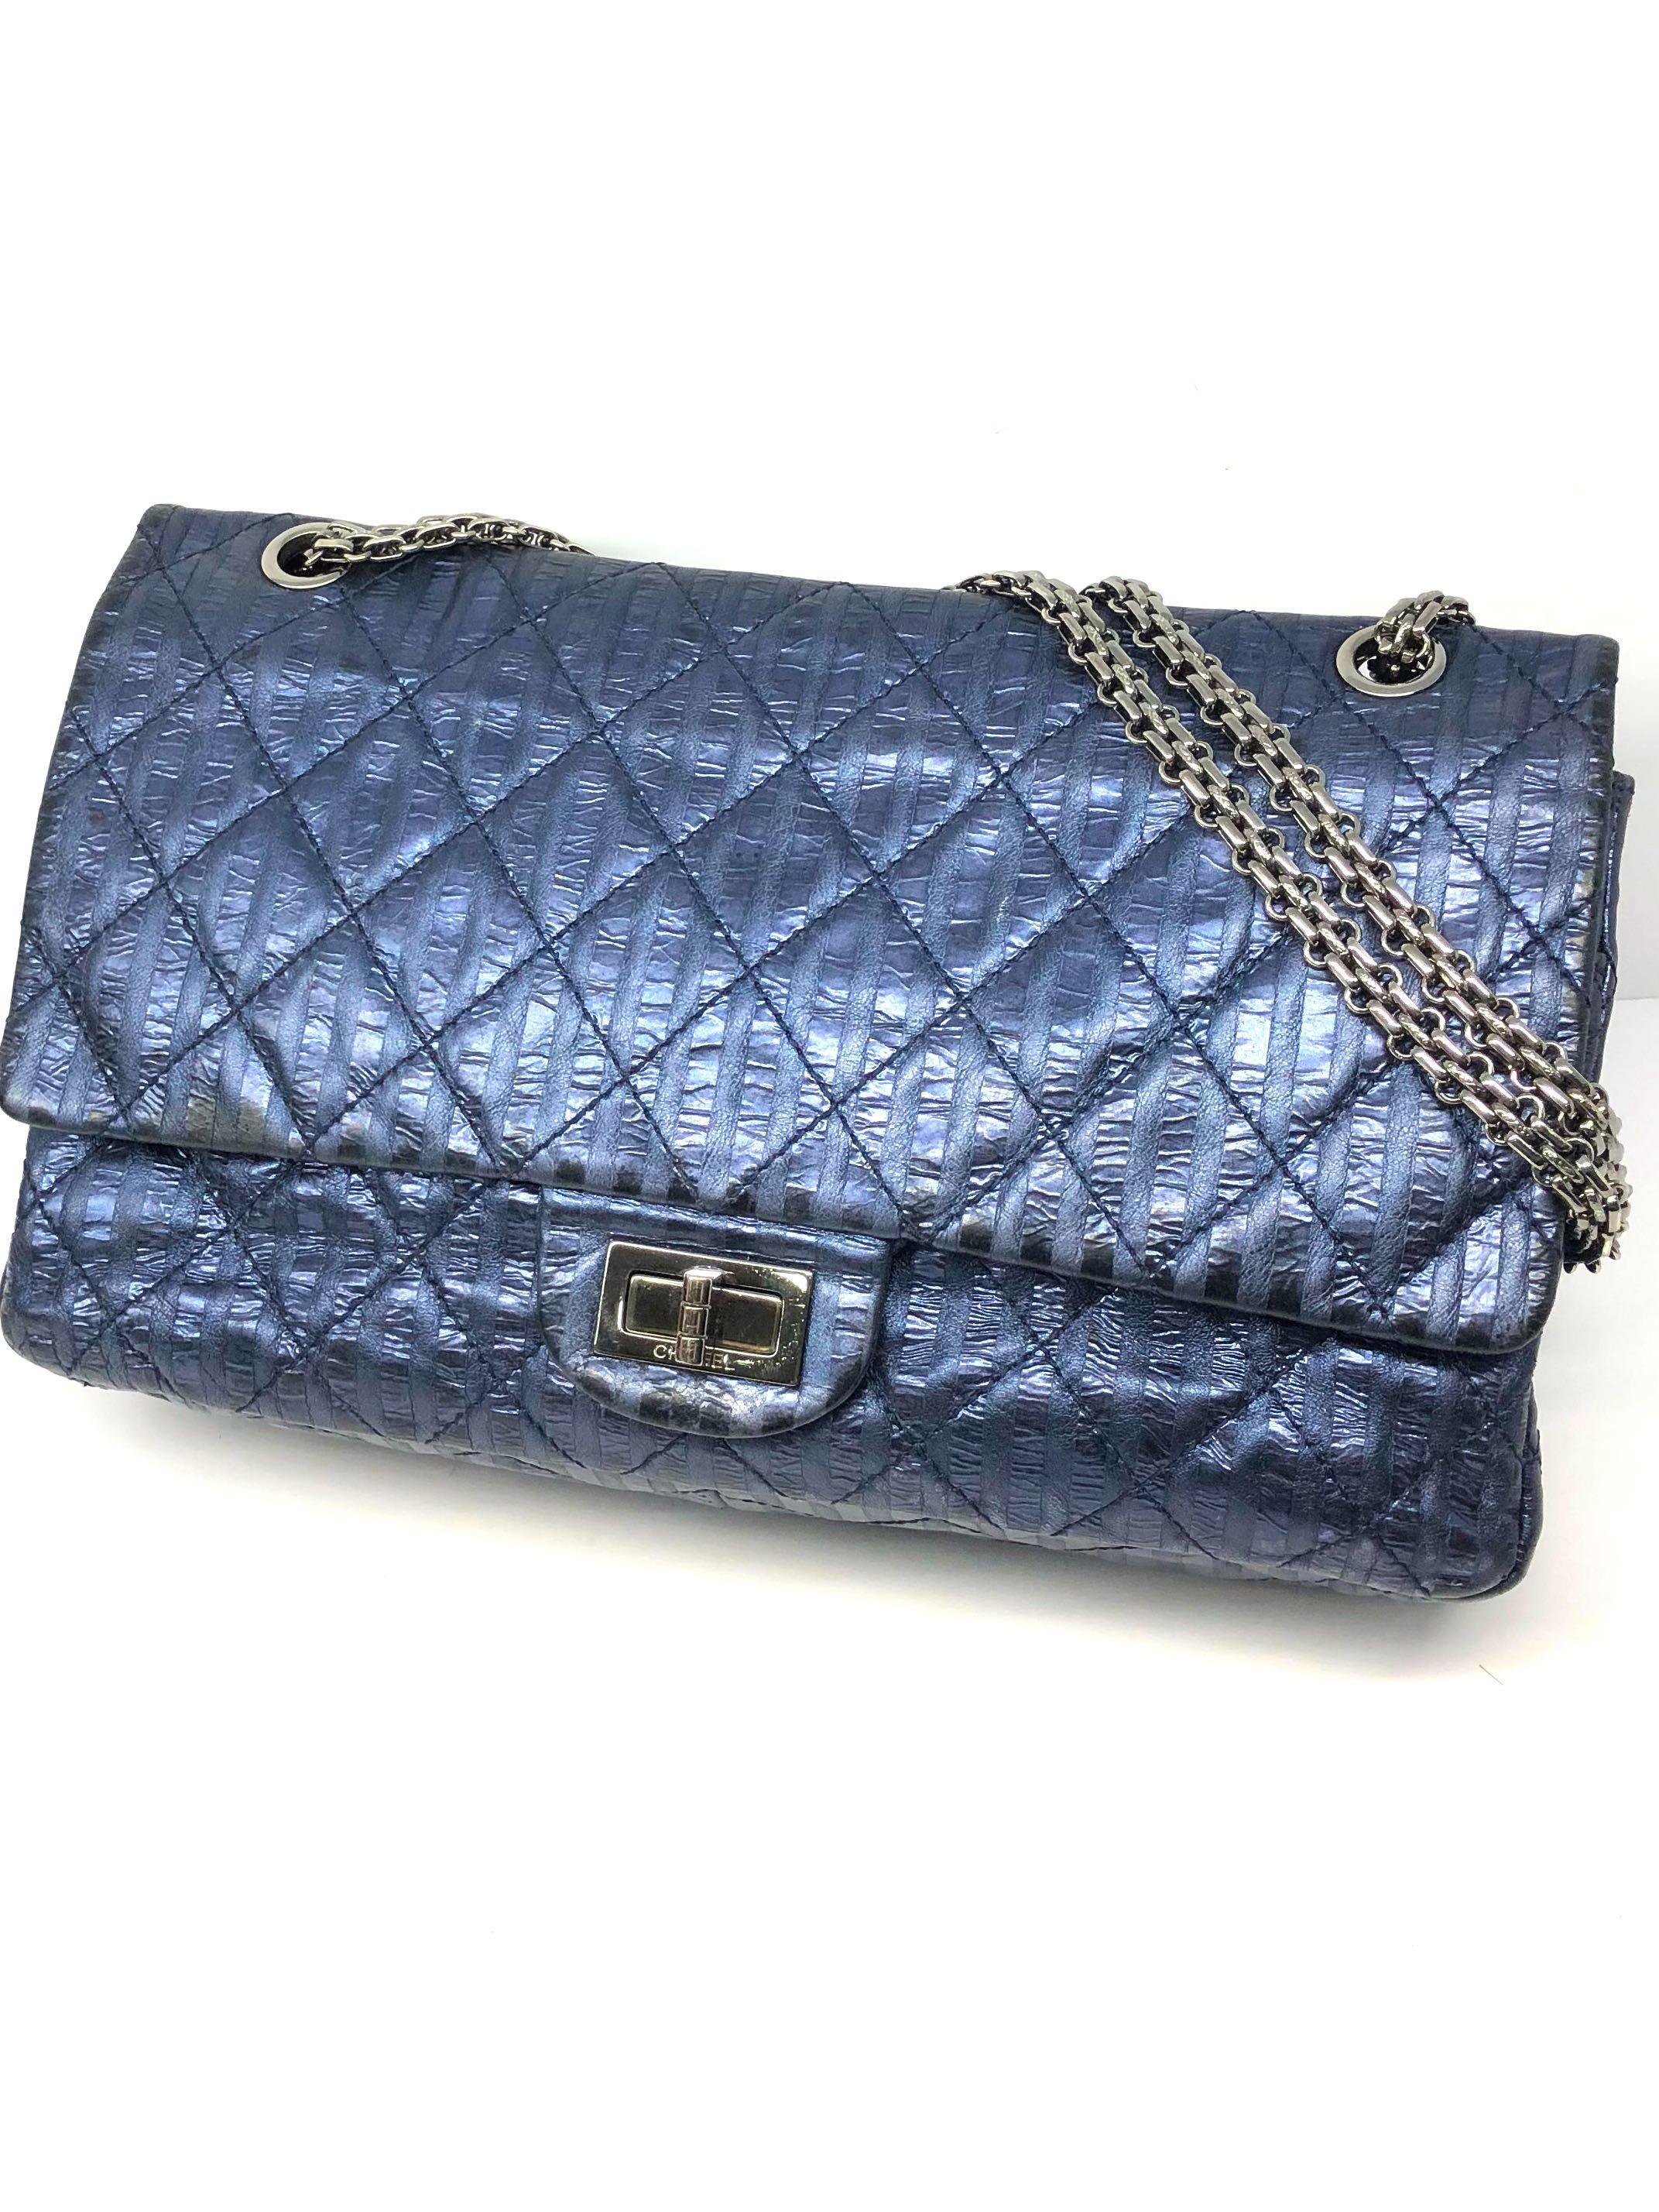 31dedb8a3bbf CHANEL 2.55 CHAIN BAG 187002493, Women's Fashion, Bags & Wallets ...